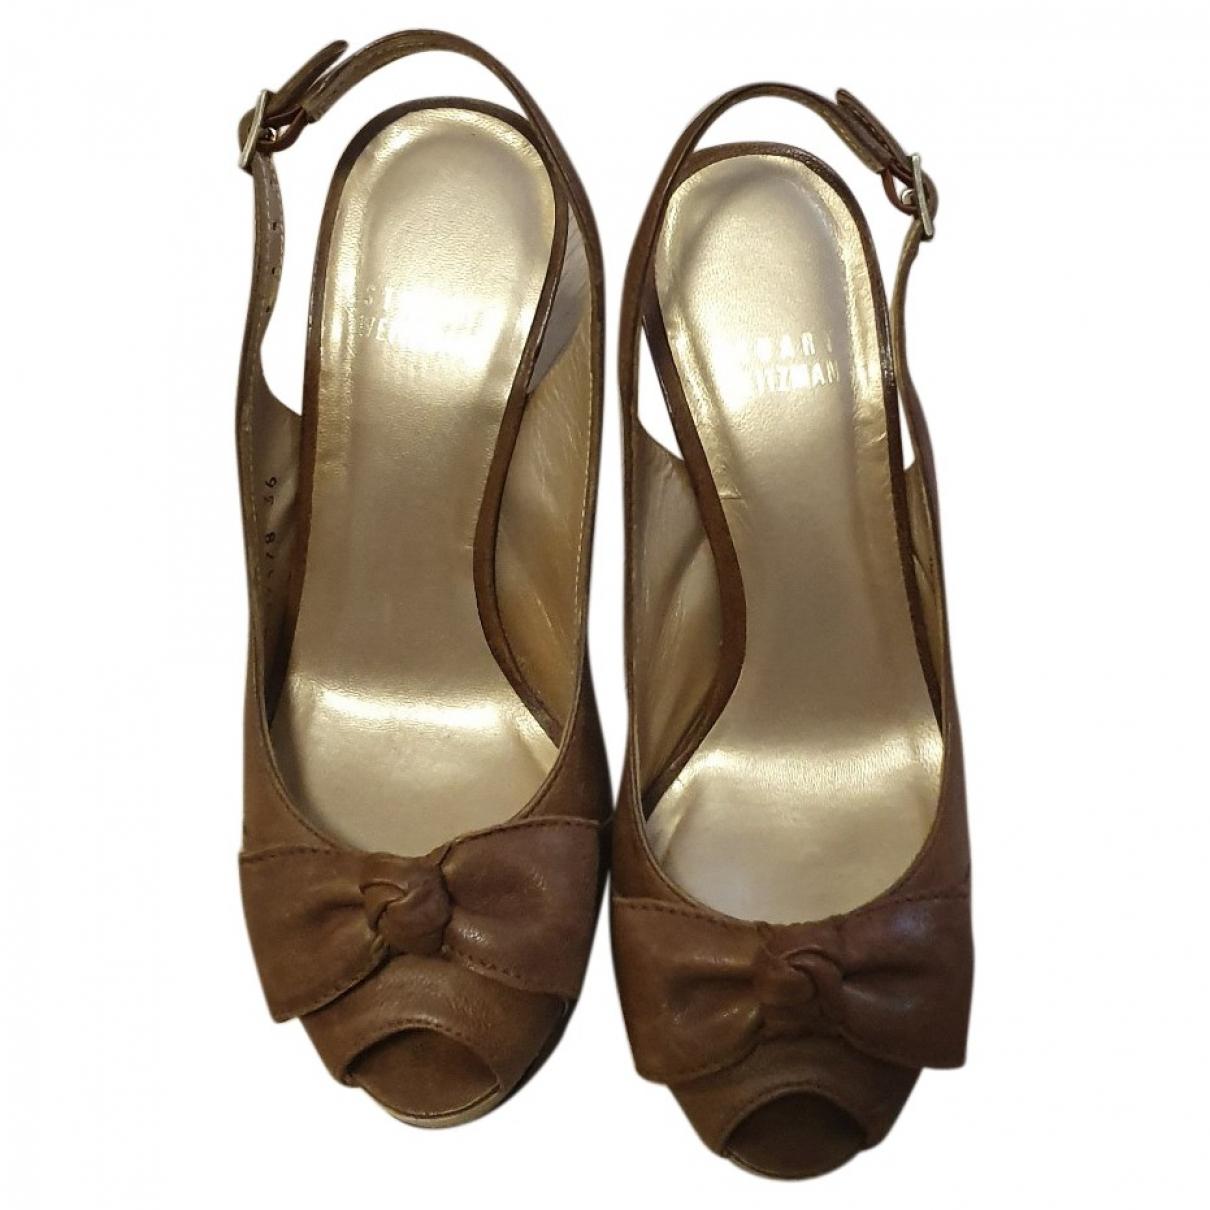 Stuart Weitzman \N Beige Leather Sandals for Women 36 EU